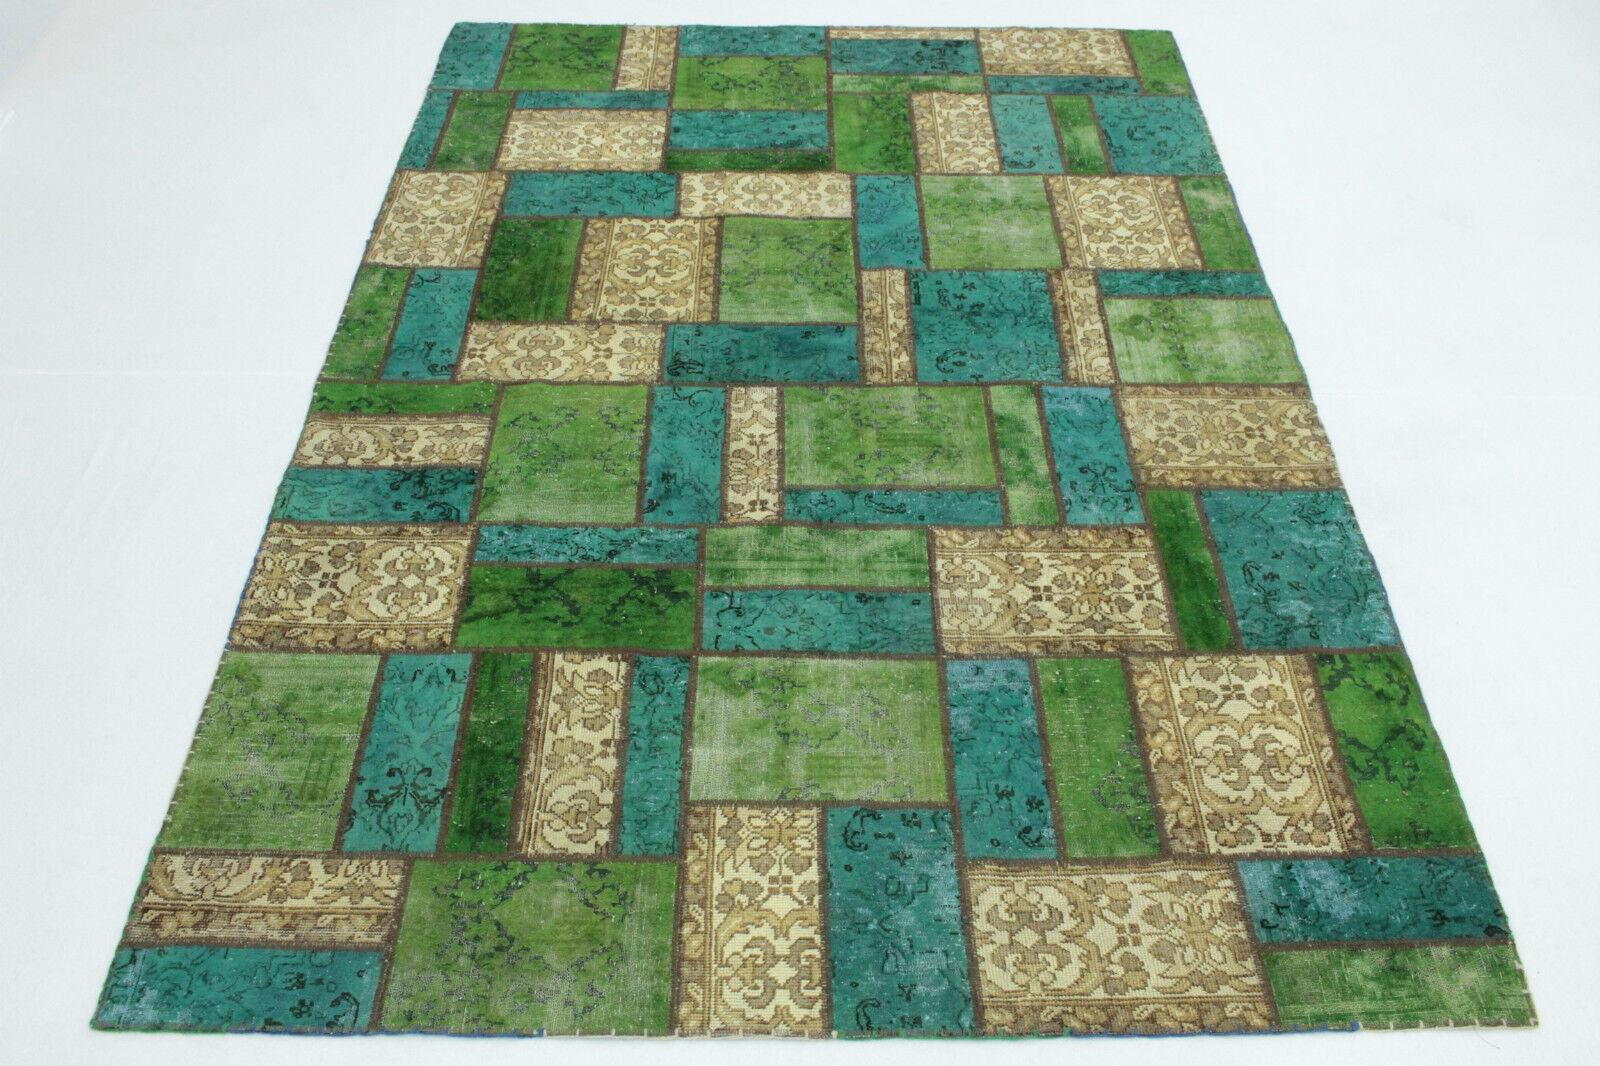 Tappeto Moderno Turchese : Patchwork vintage vintage vintage tappeto orientale beige turchese